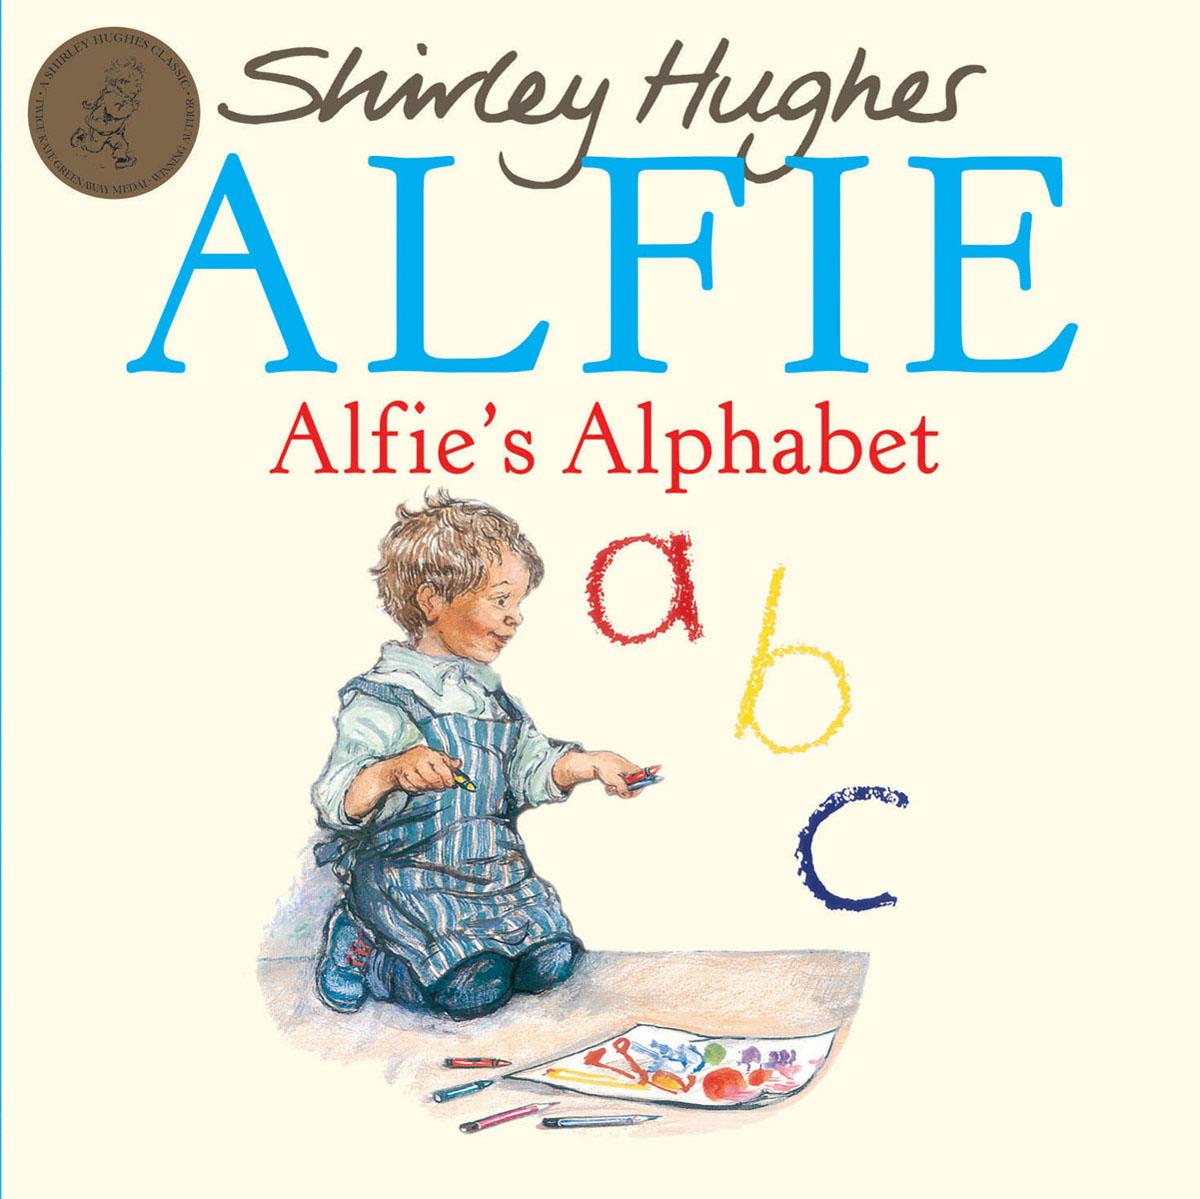 Alfie's Alphabet